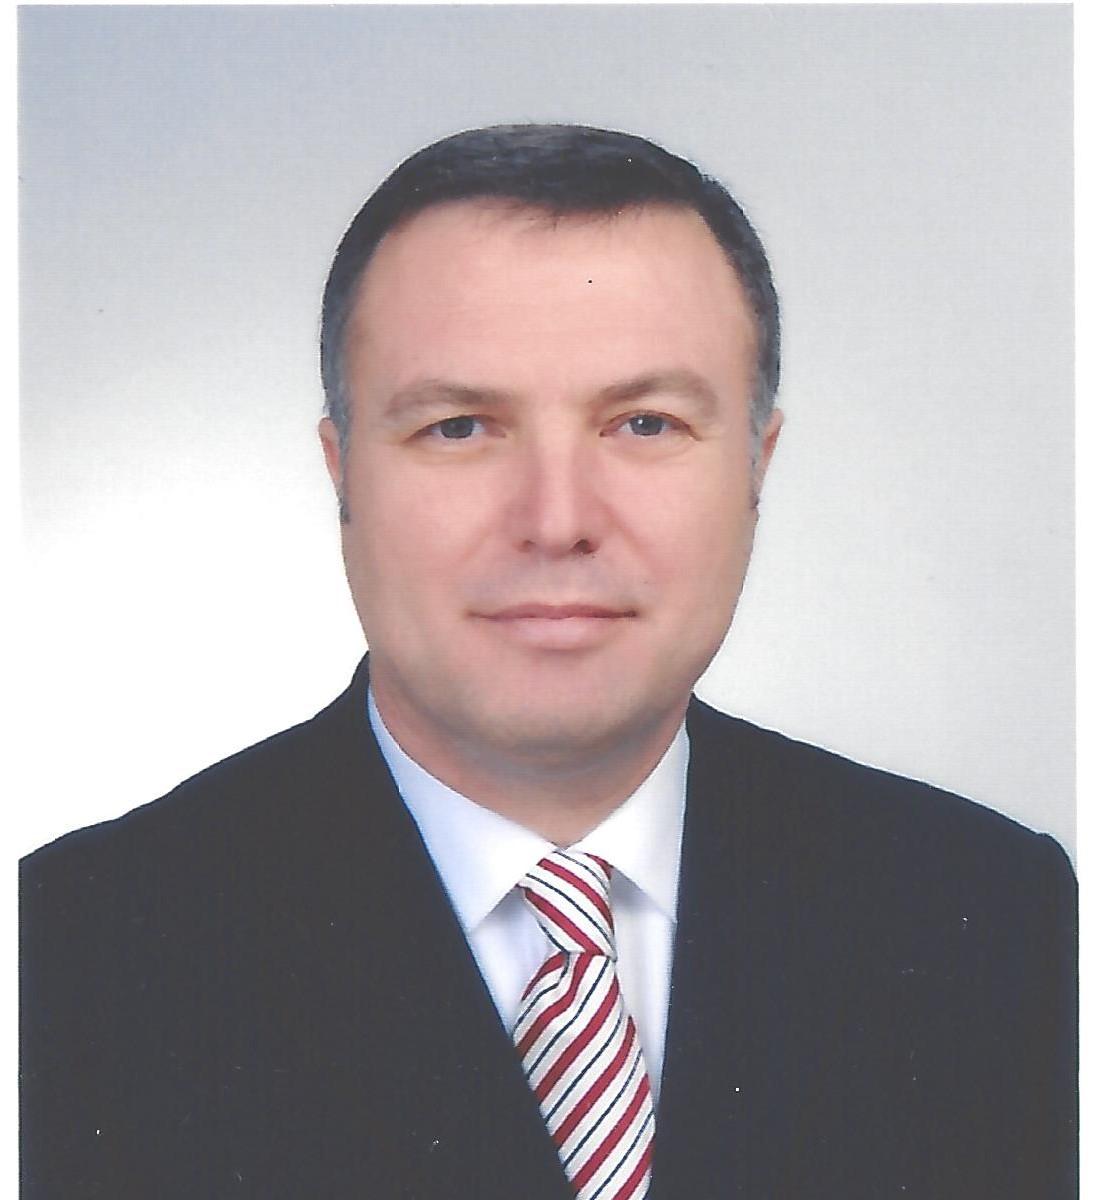 Erdoğan Bülbül